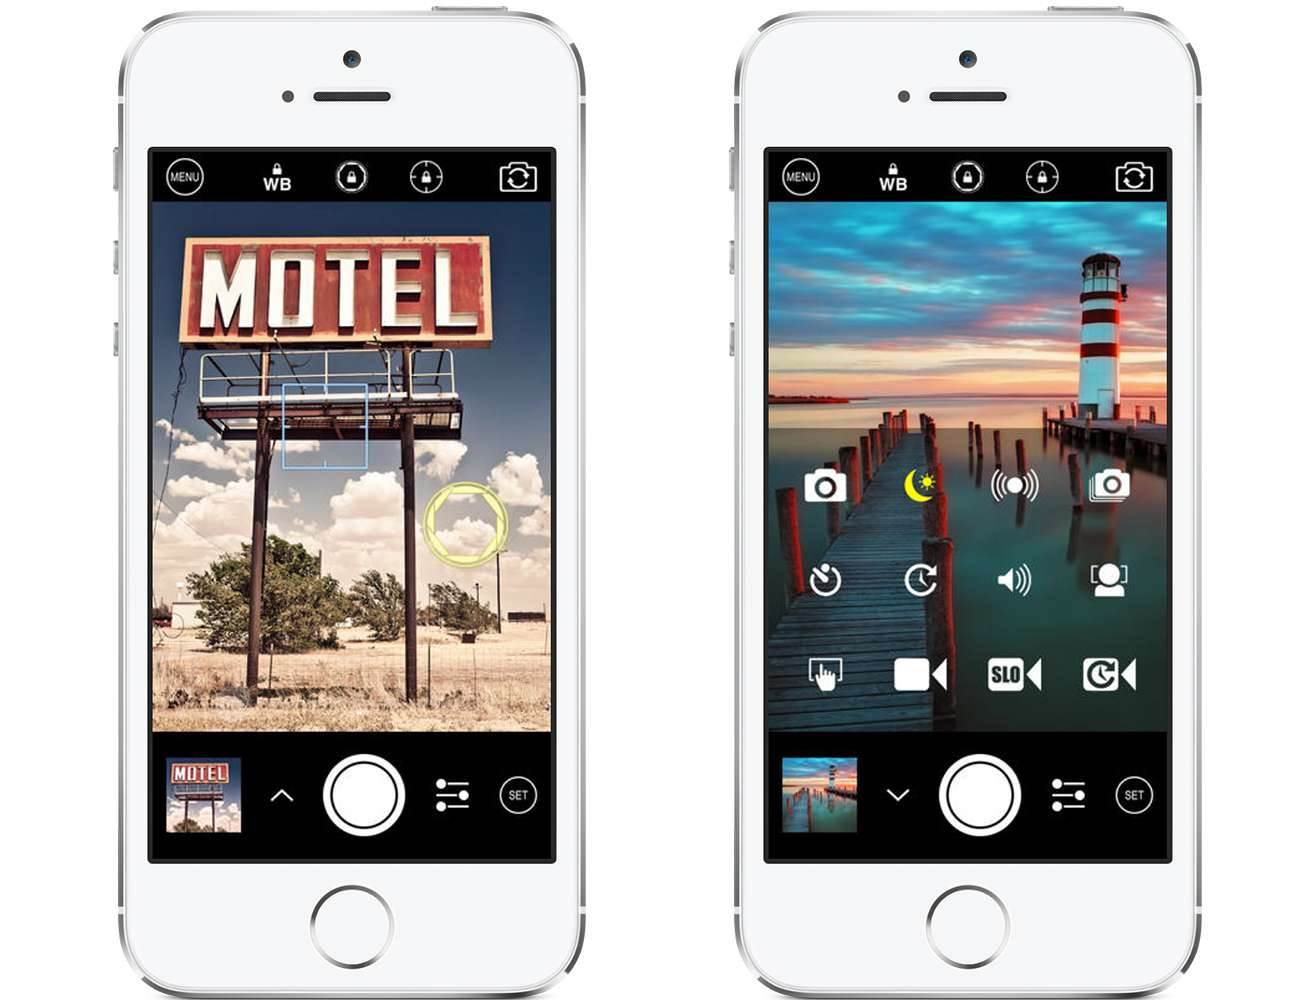 ProCam 2 za darmo w App Store!  nowosci AppStore   Ap1